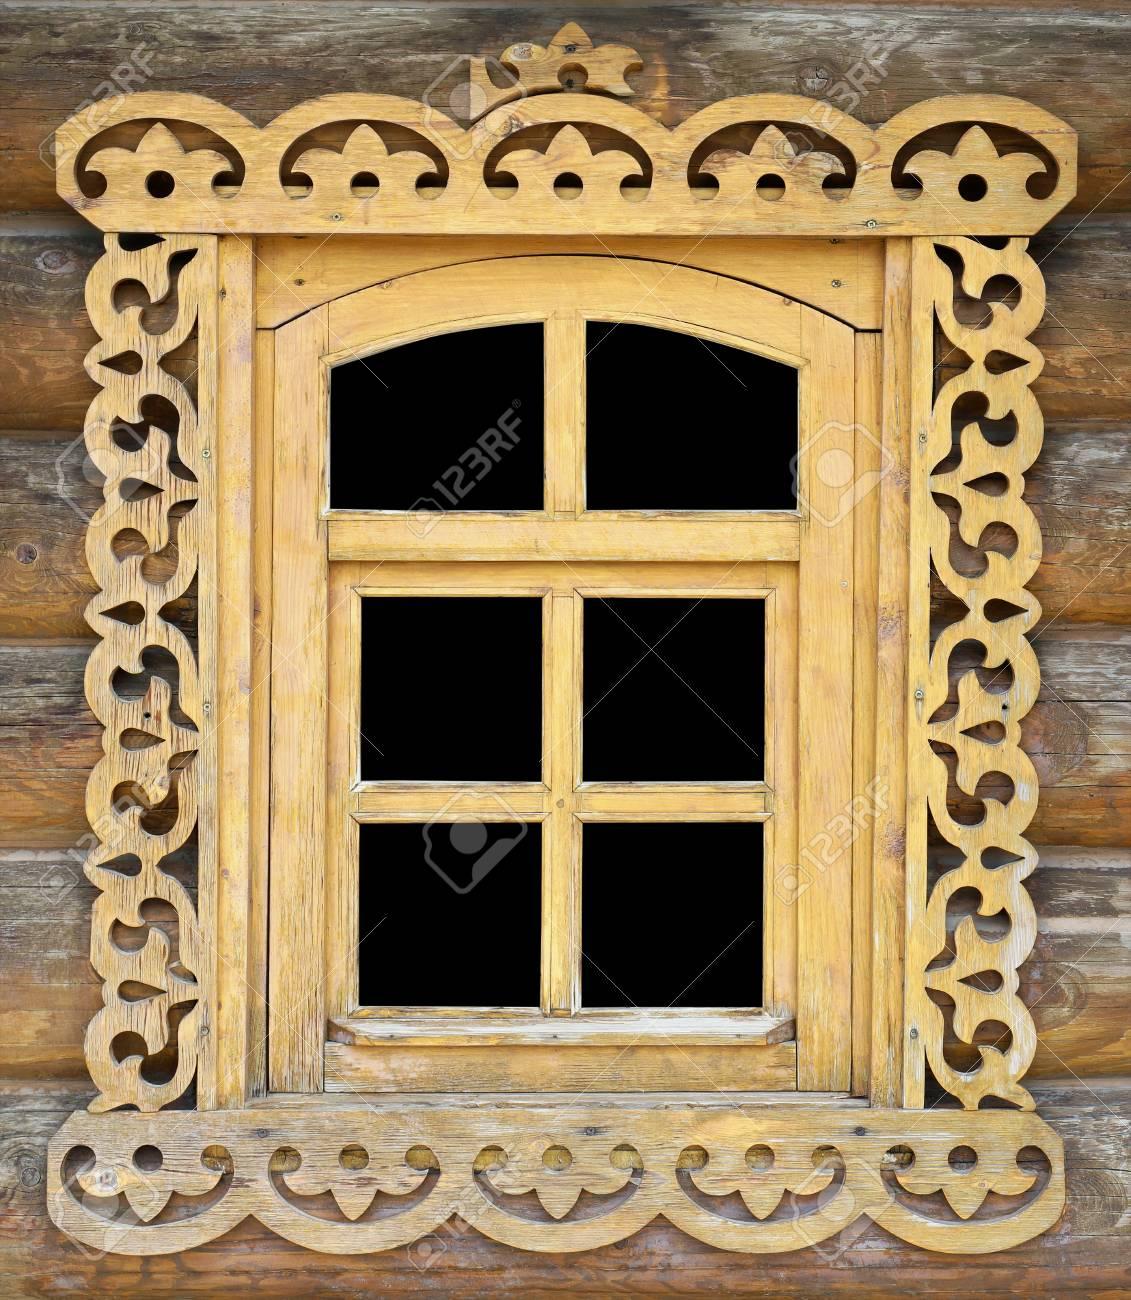 Handmade Carved Wooden Window Frame In A Log Village Shed